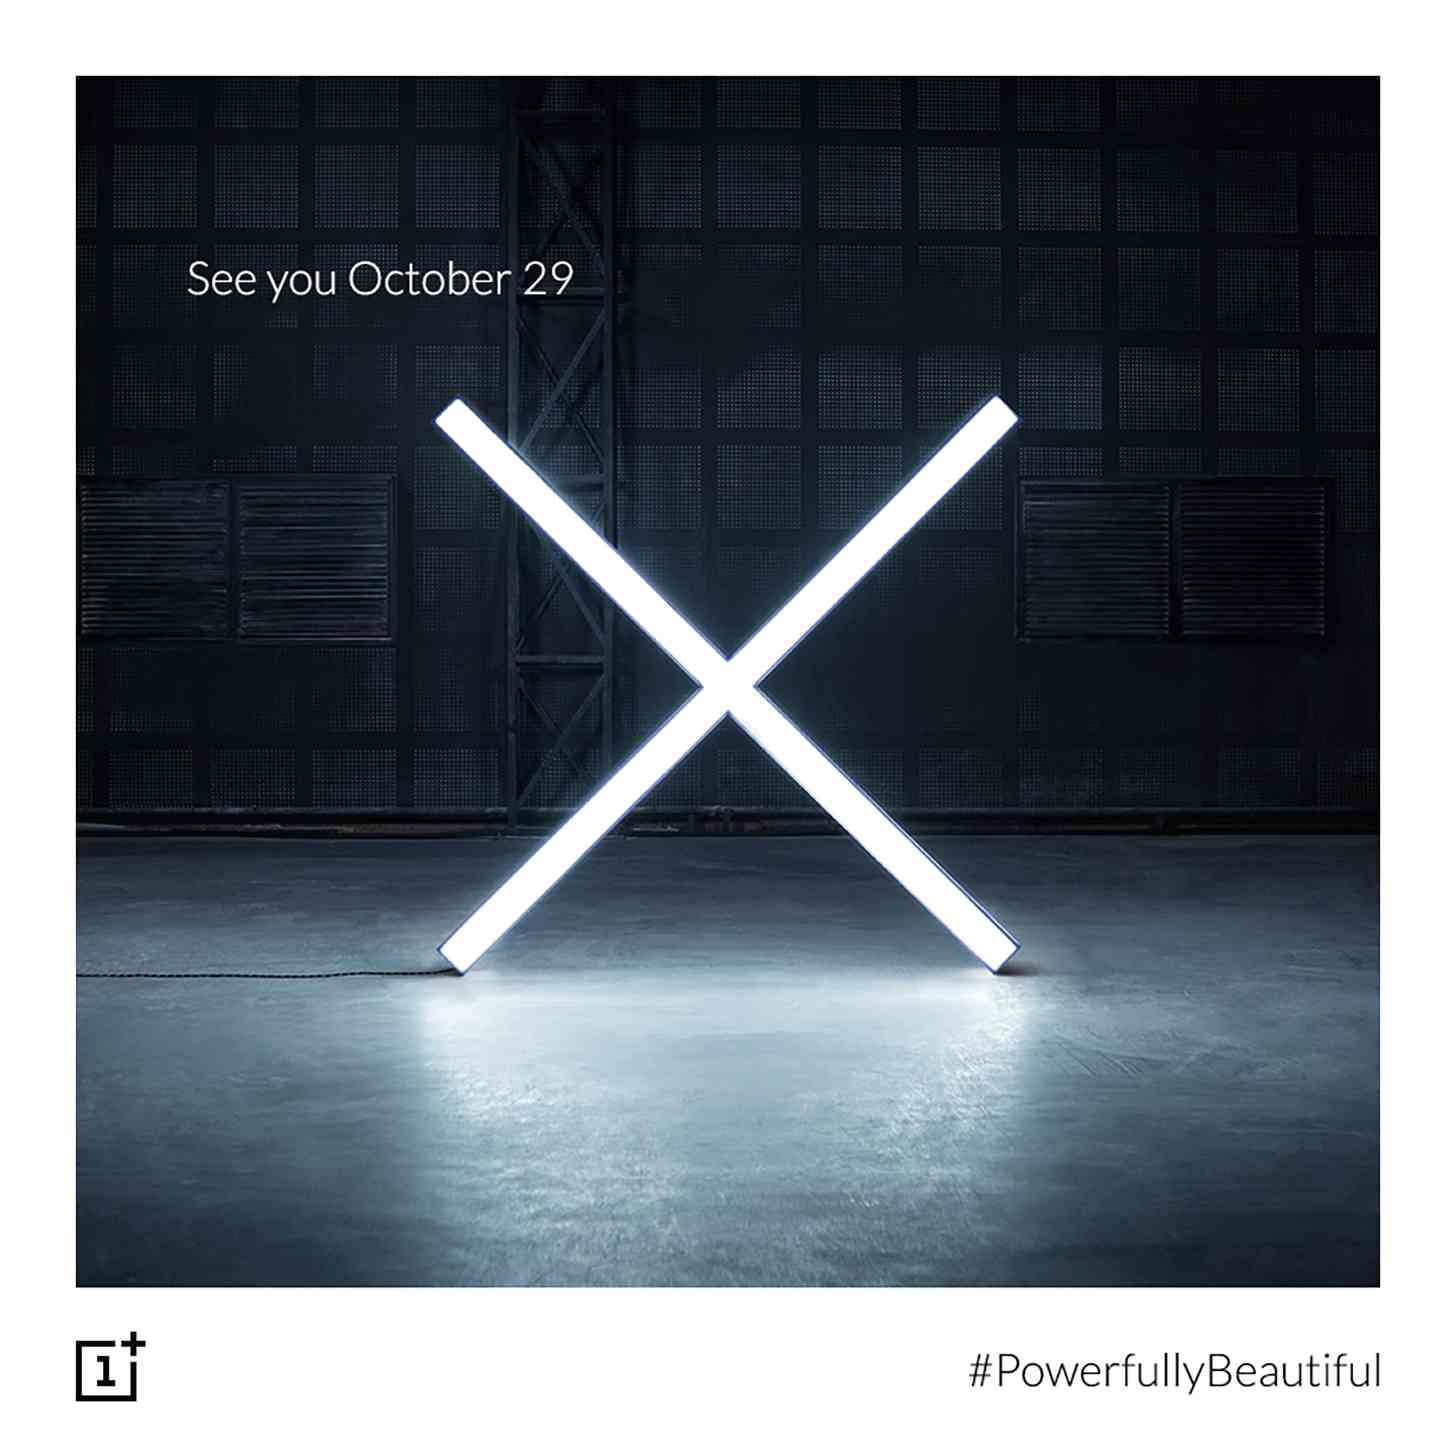 OnePlus X October 29 teaser